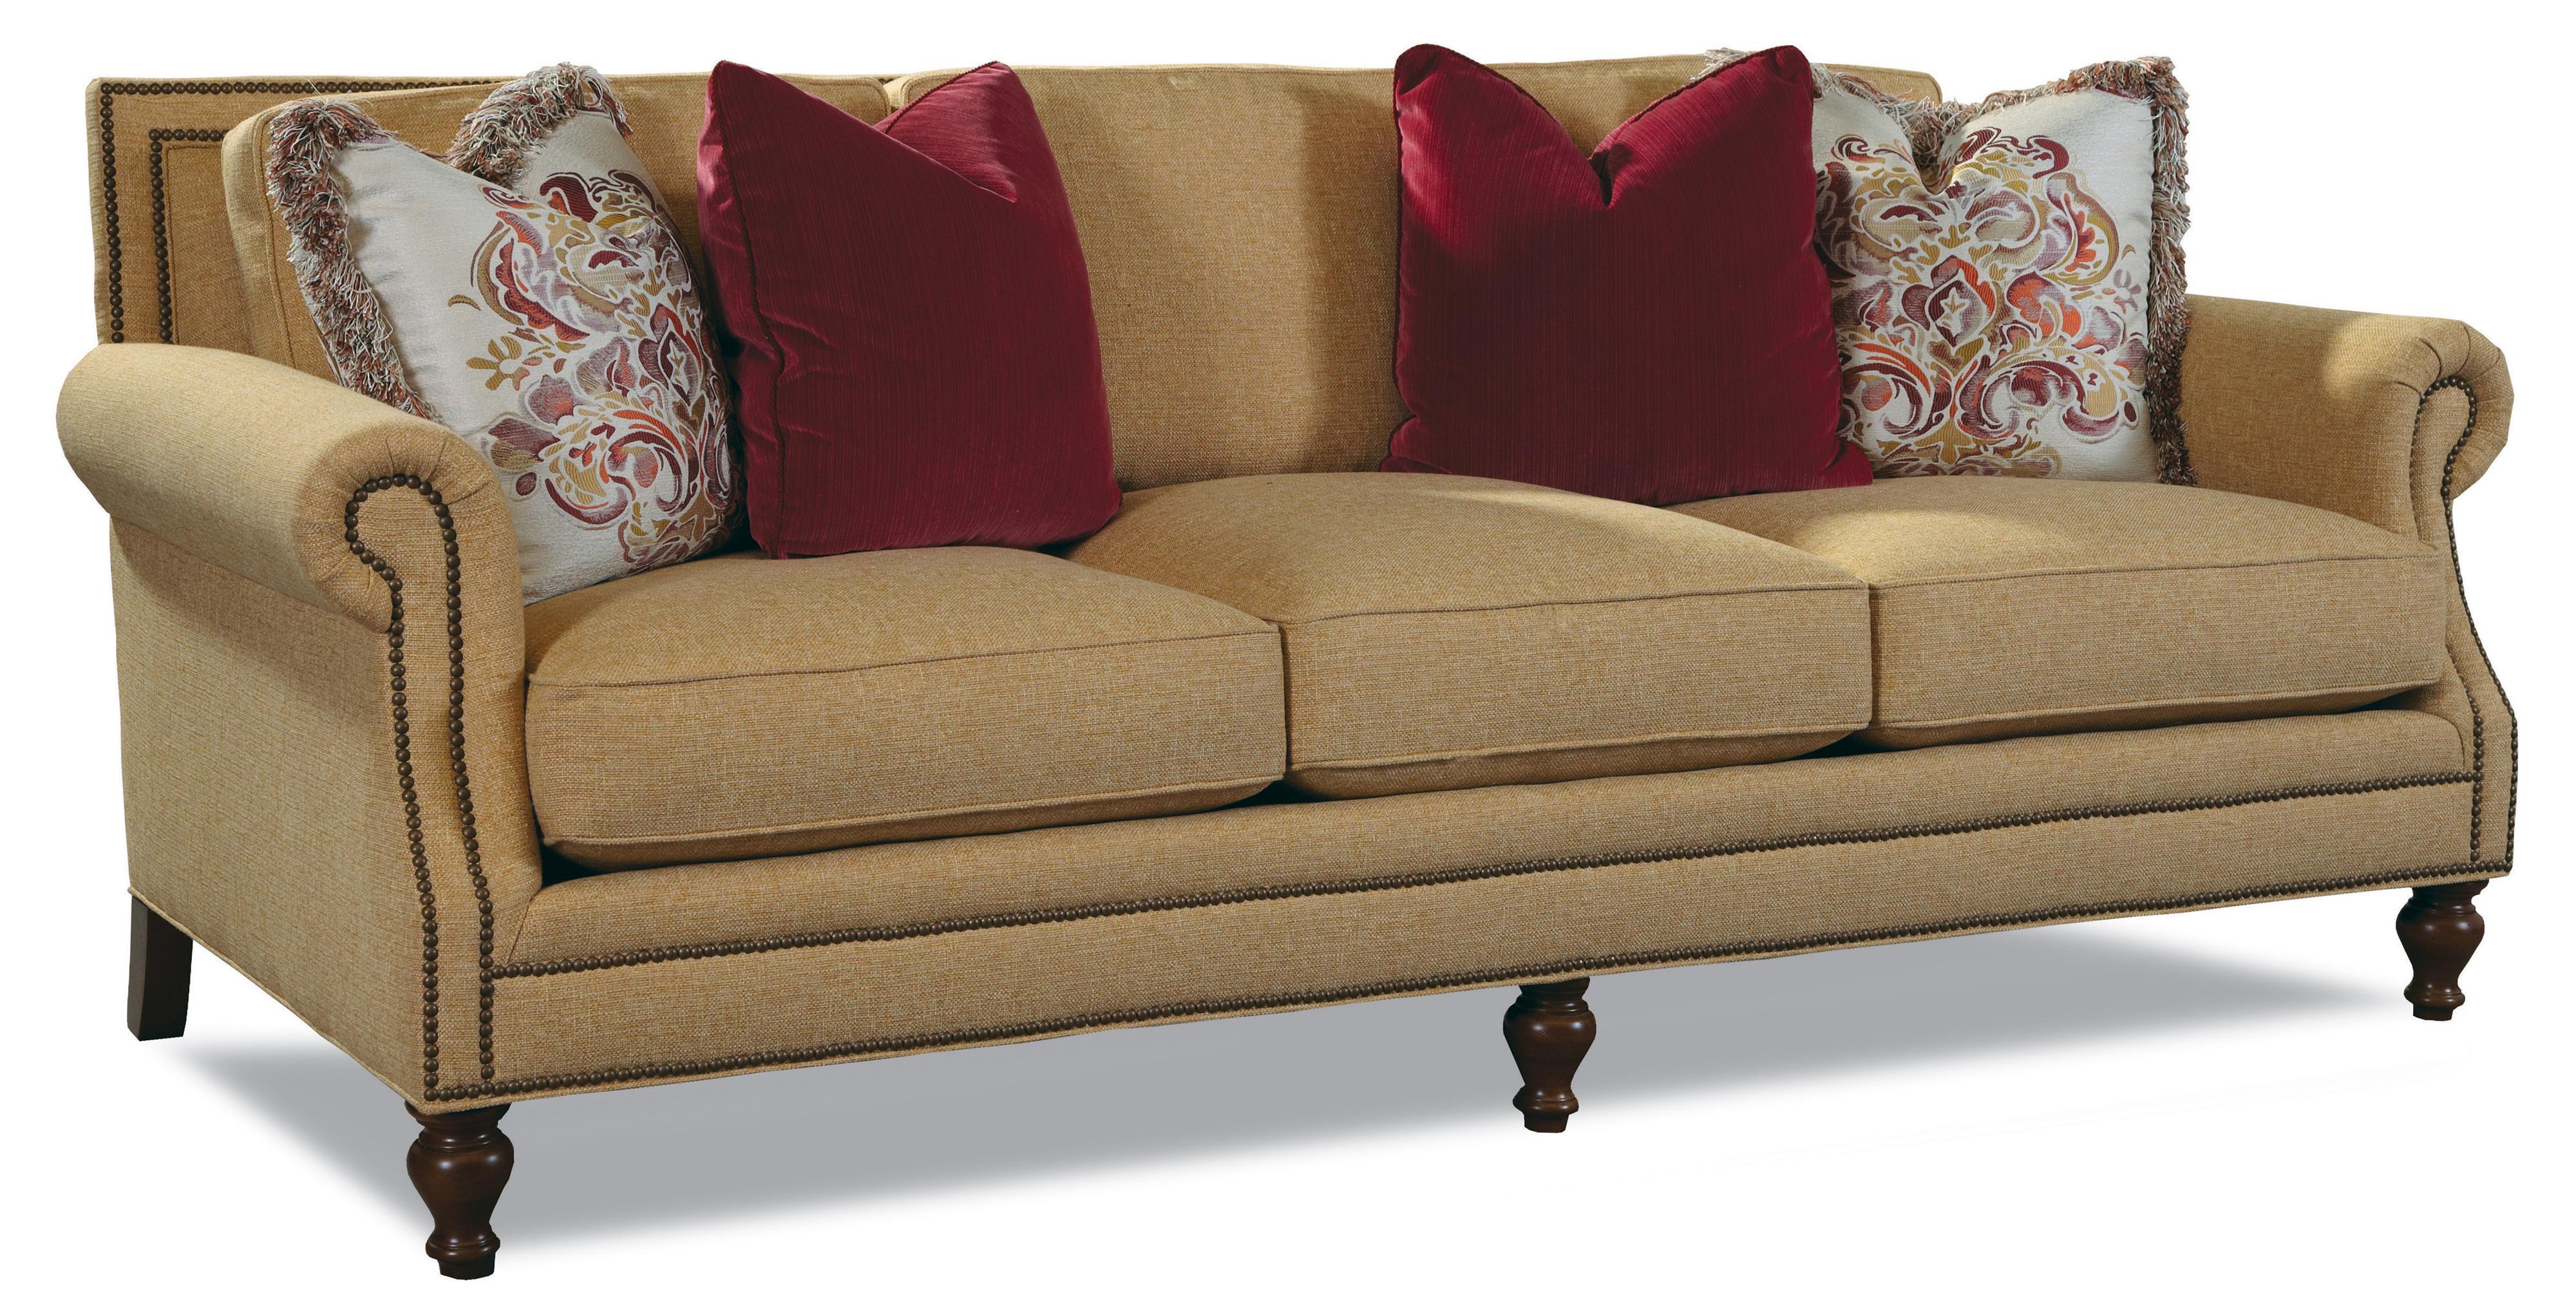 7220 Sofa by Geoffrey Alexander at Sprintz Furniture